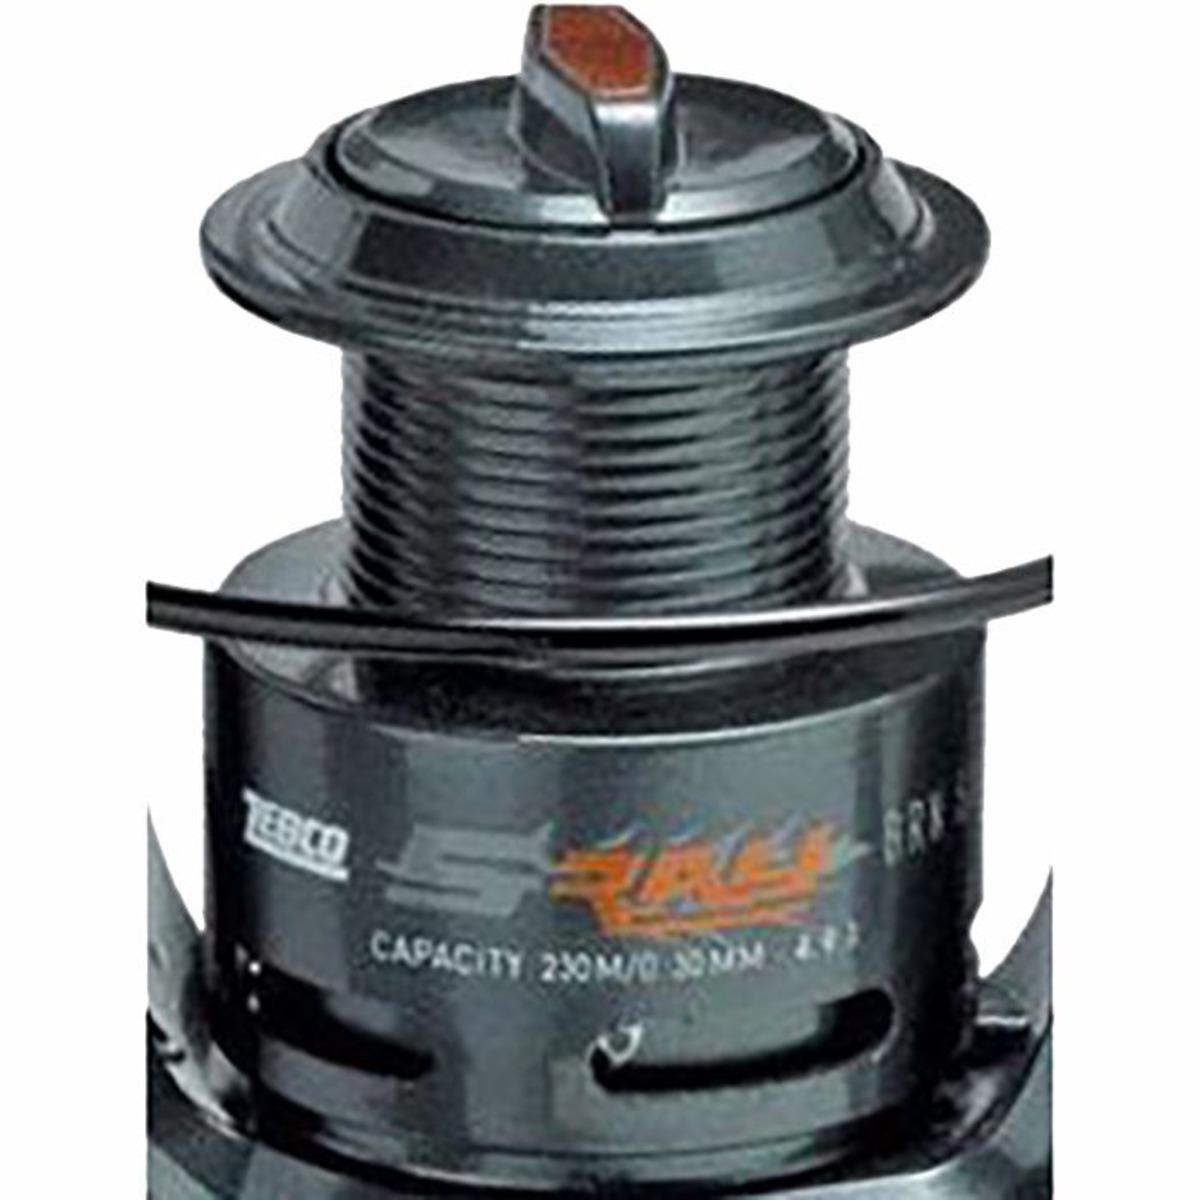 Zebco Bobina de Repuesto S-Ray Brn - 3000 - Aluminium